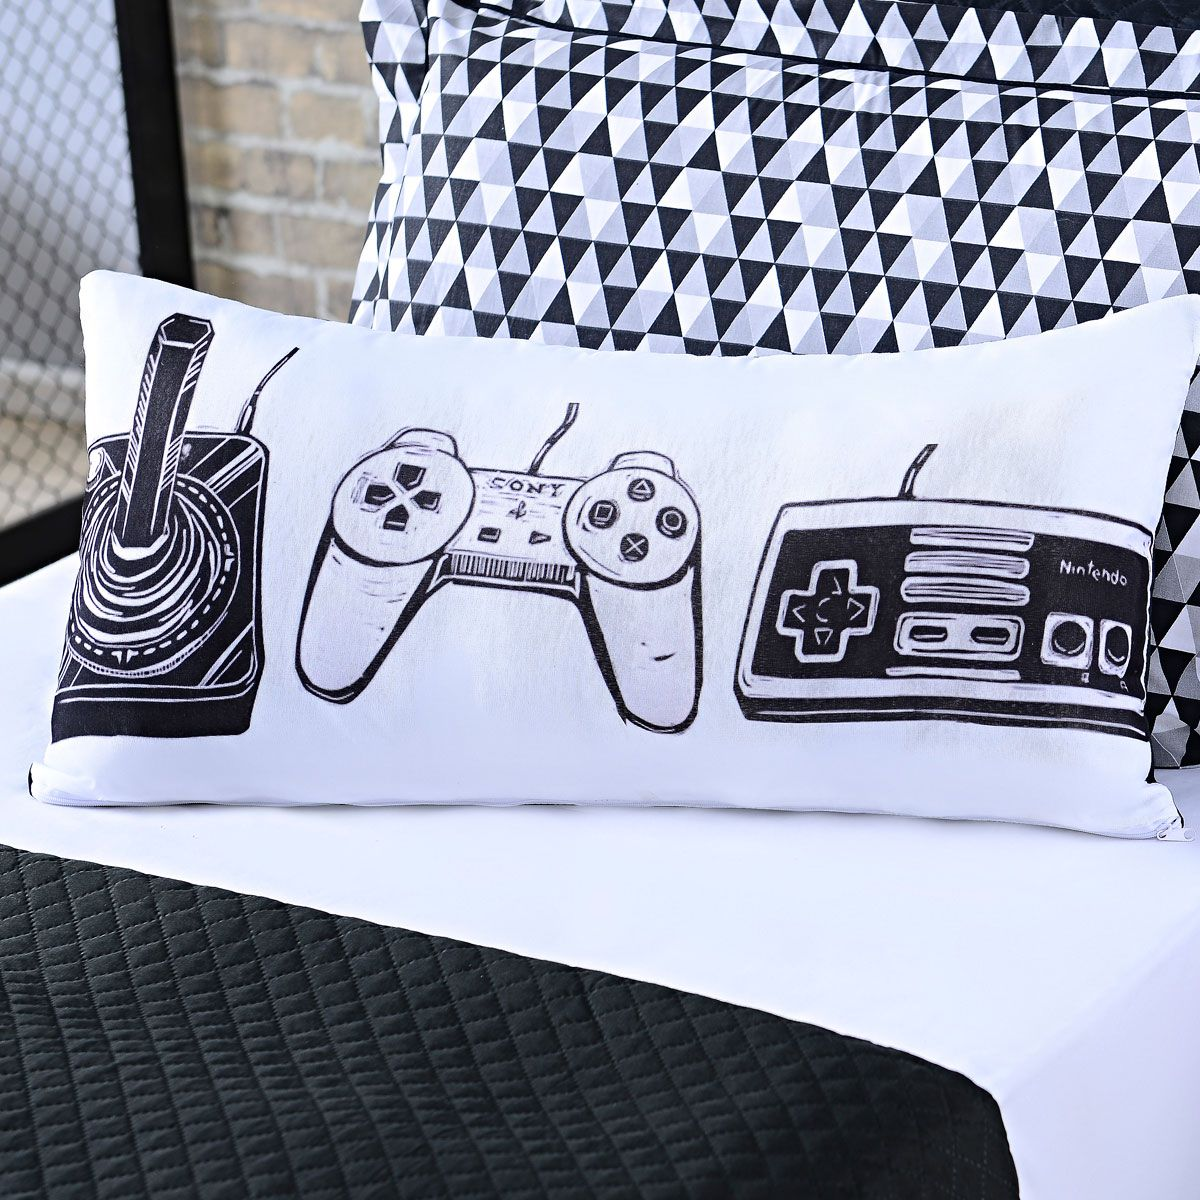 Kit 10 Capas de Almofadas Infantil Game Retrô Branco/Preto 60cm x 30cm